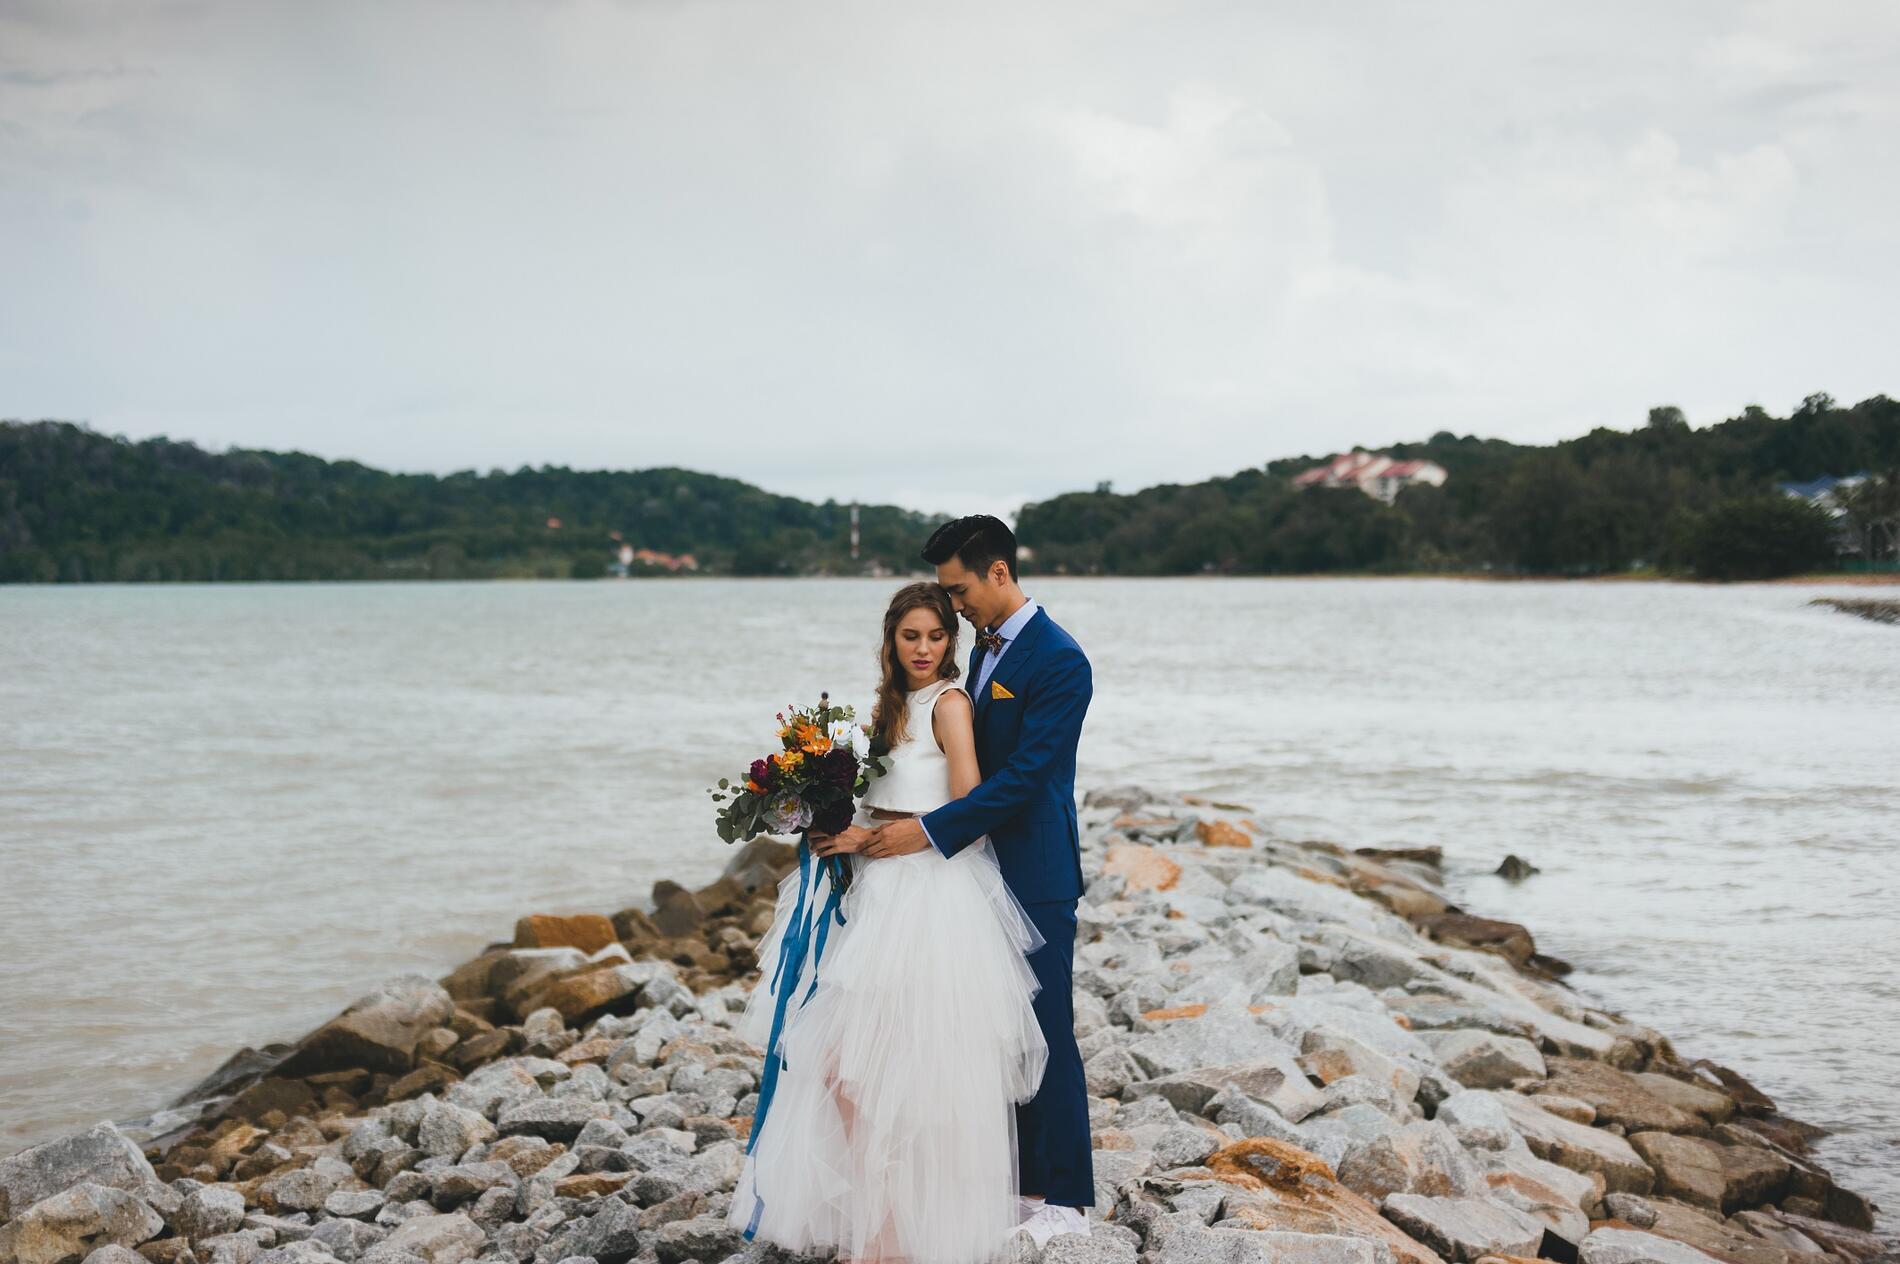 Port Dickson Wedding Venues & Packages | Lexis Hibiscus Port Dic